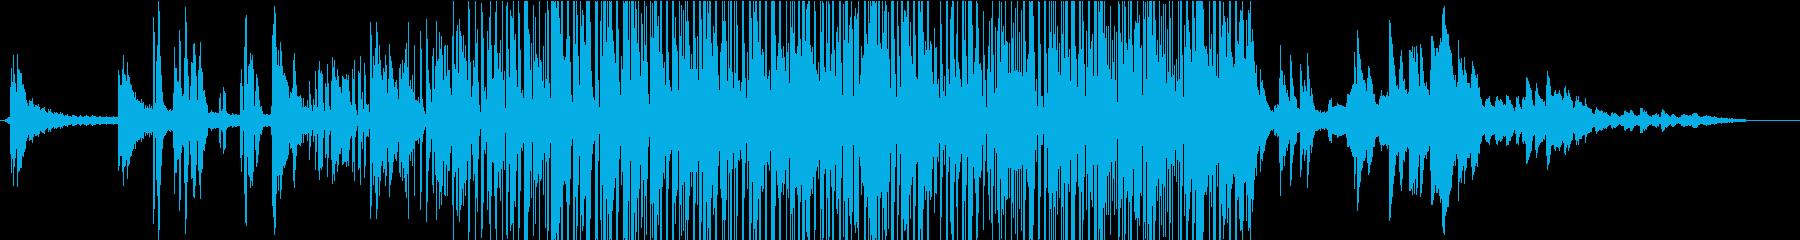 moonの再生済みの波形